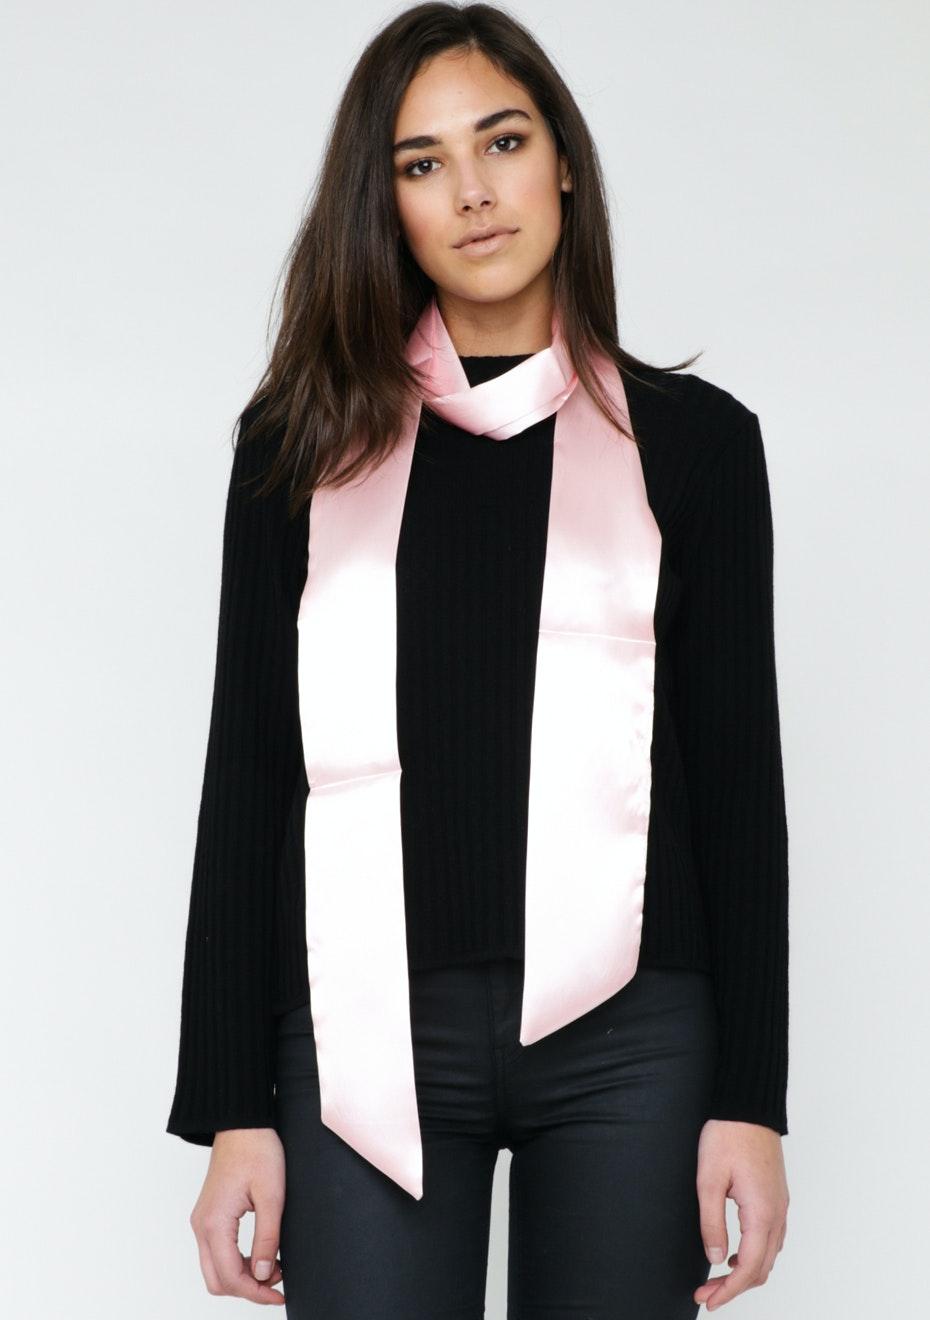 Satin Solid Skinny Tie Scarf - Pink